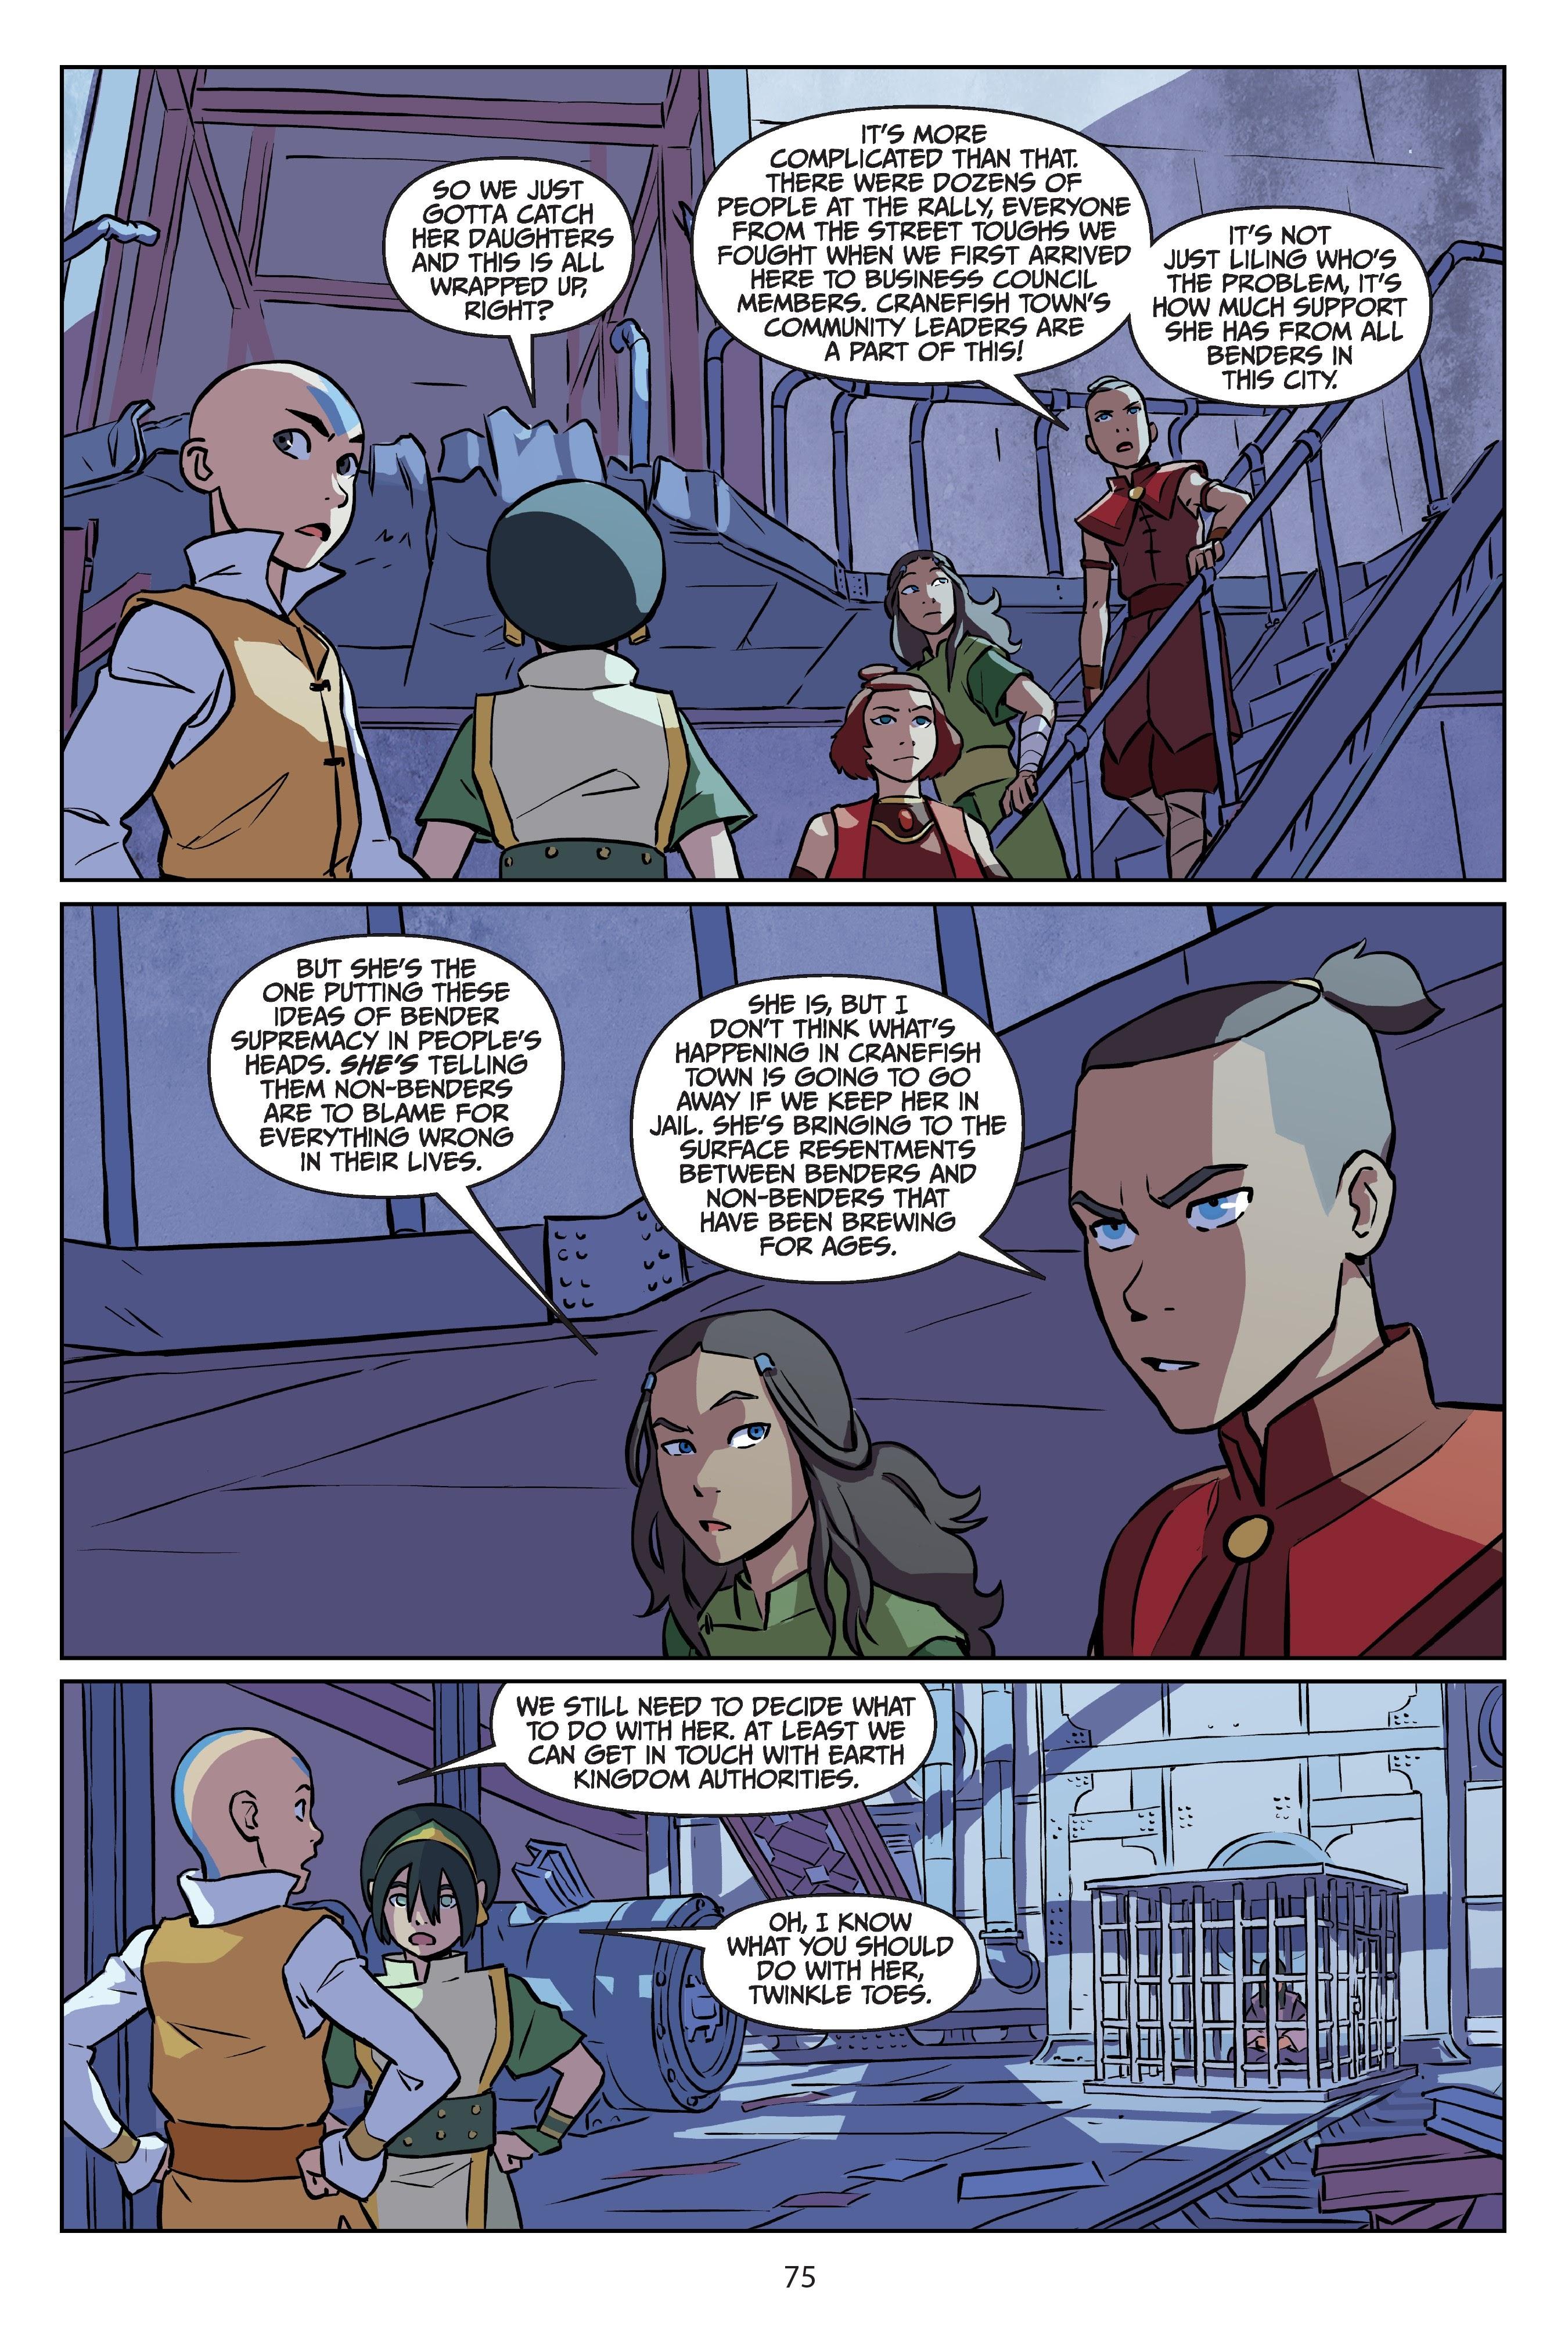 Nickelodeon Avatar: The Last Airbender - Imbalance TPB_2 Page 75